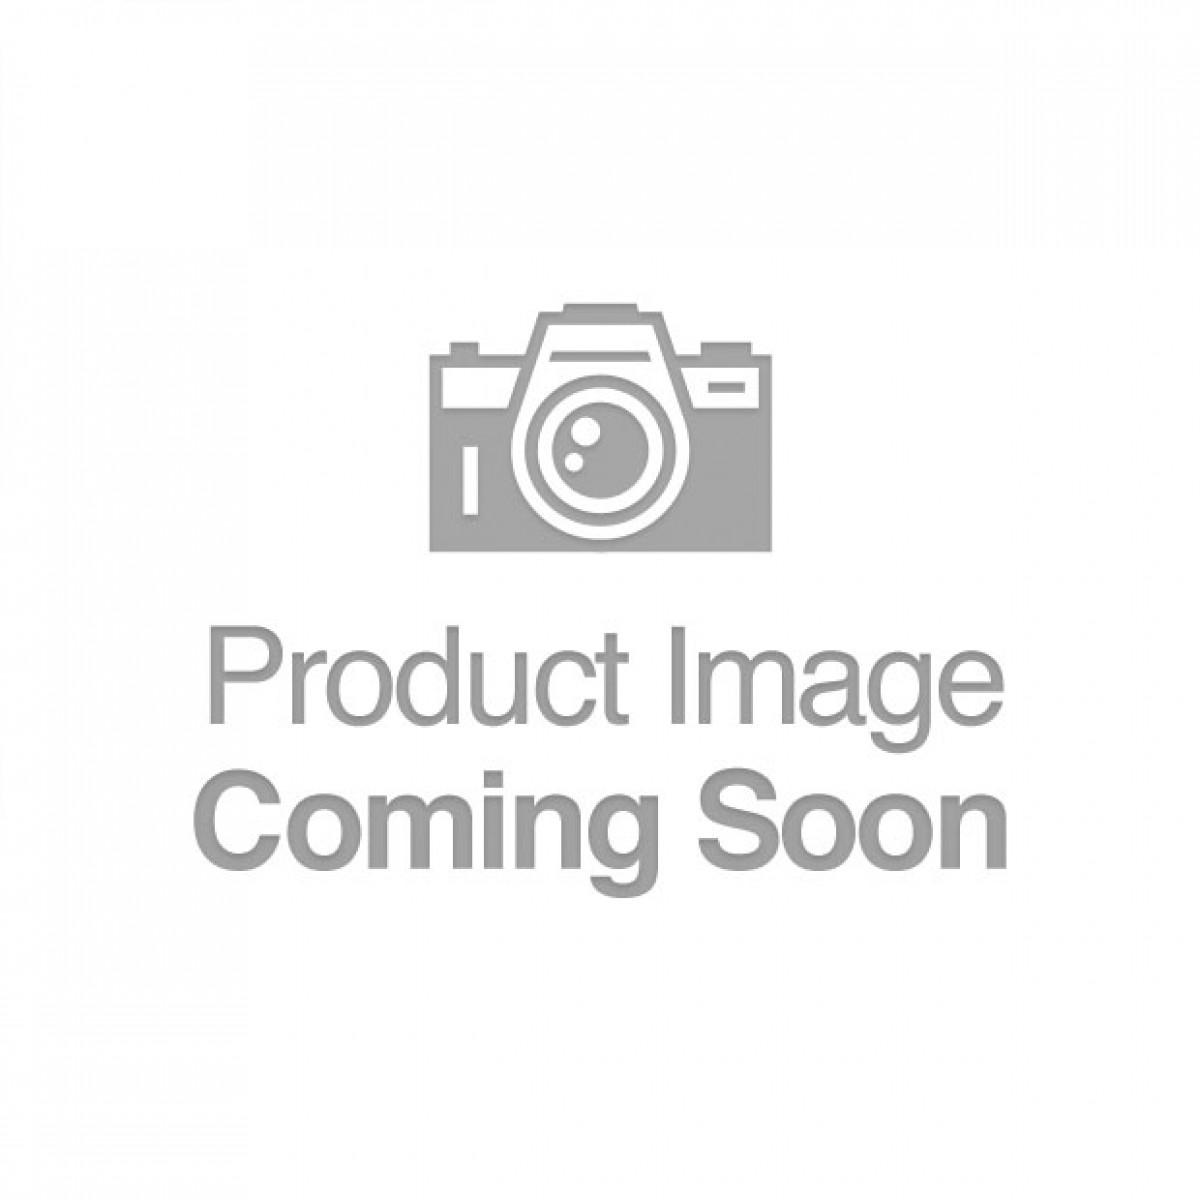 OHNUT Intimate Wearable Bumper - Aloe Set of 4